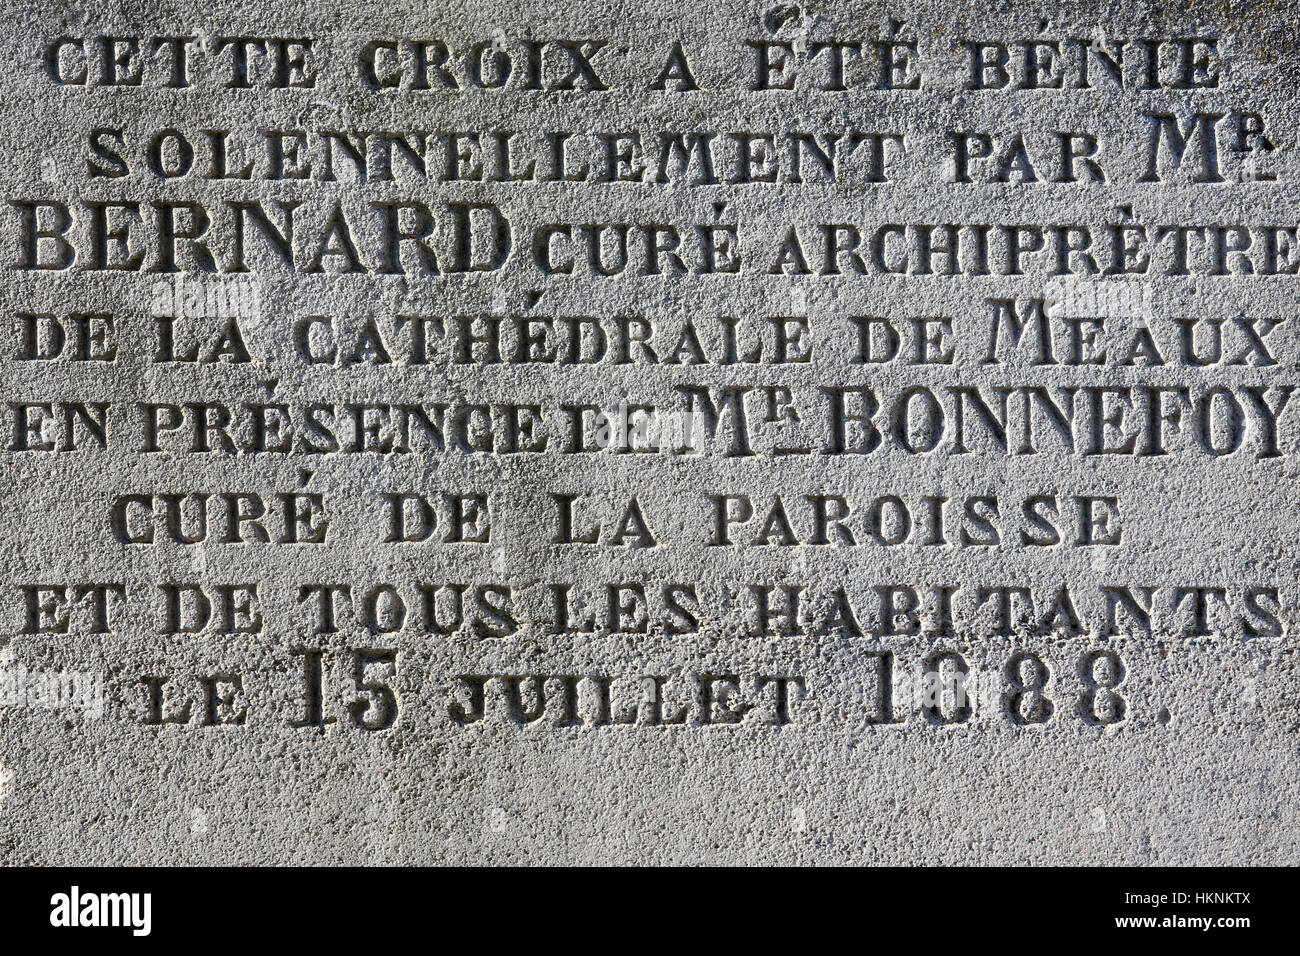 Herr Bernard. Pfarrer Erzpriester der Kathedrale von Meaux. Stockbild